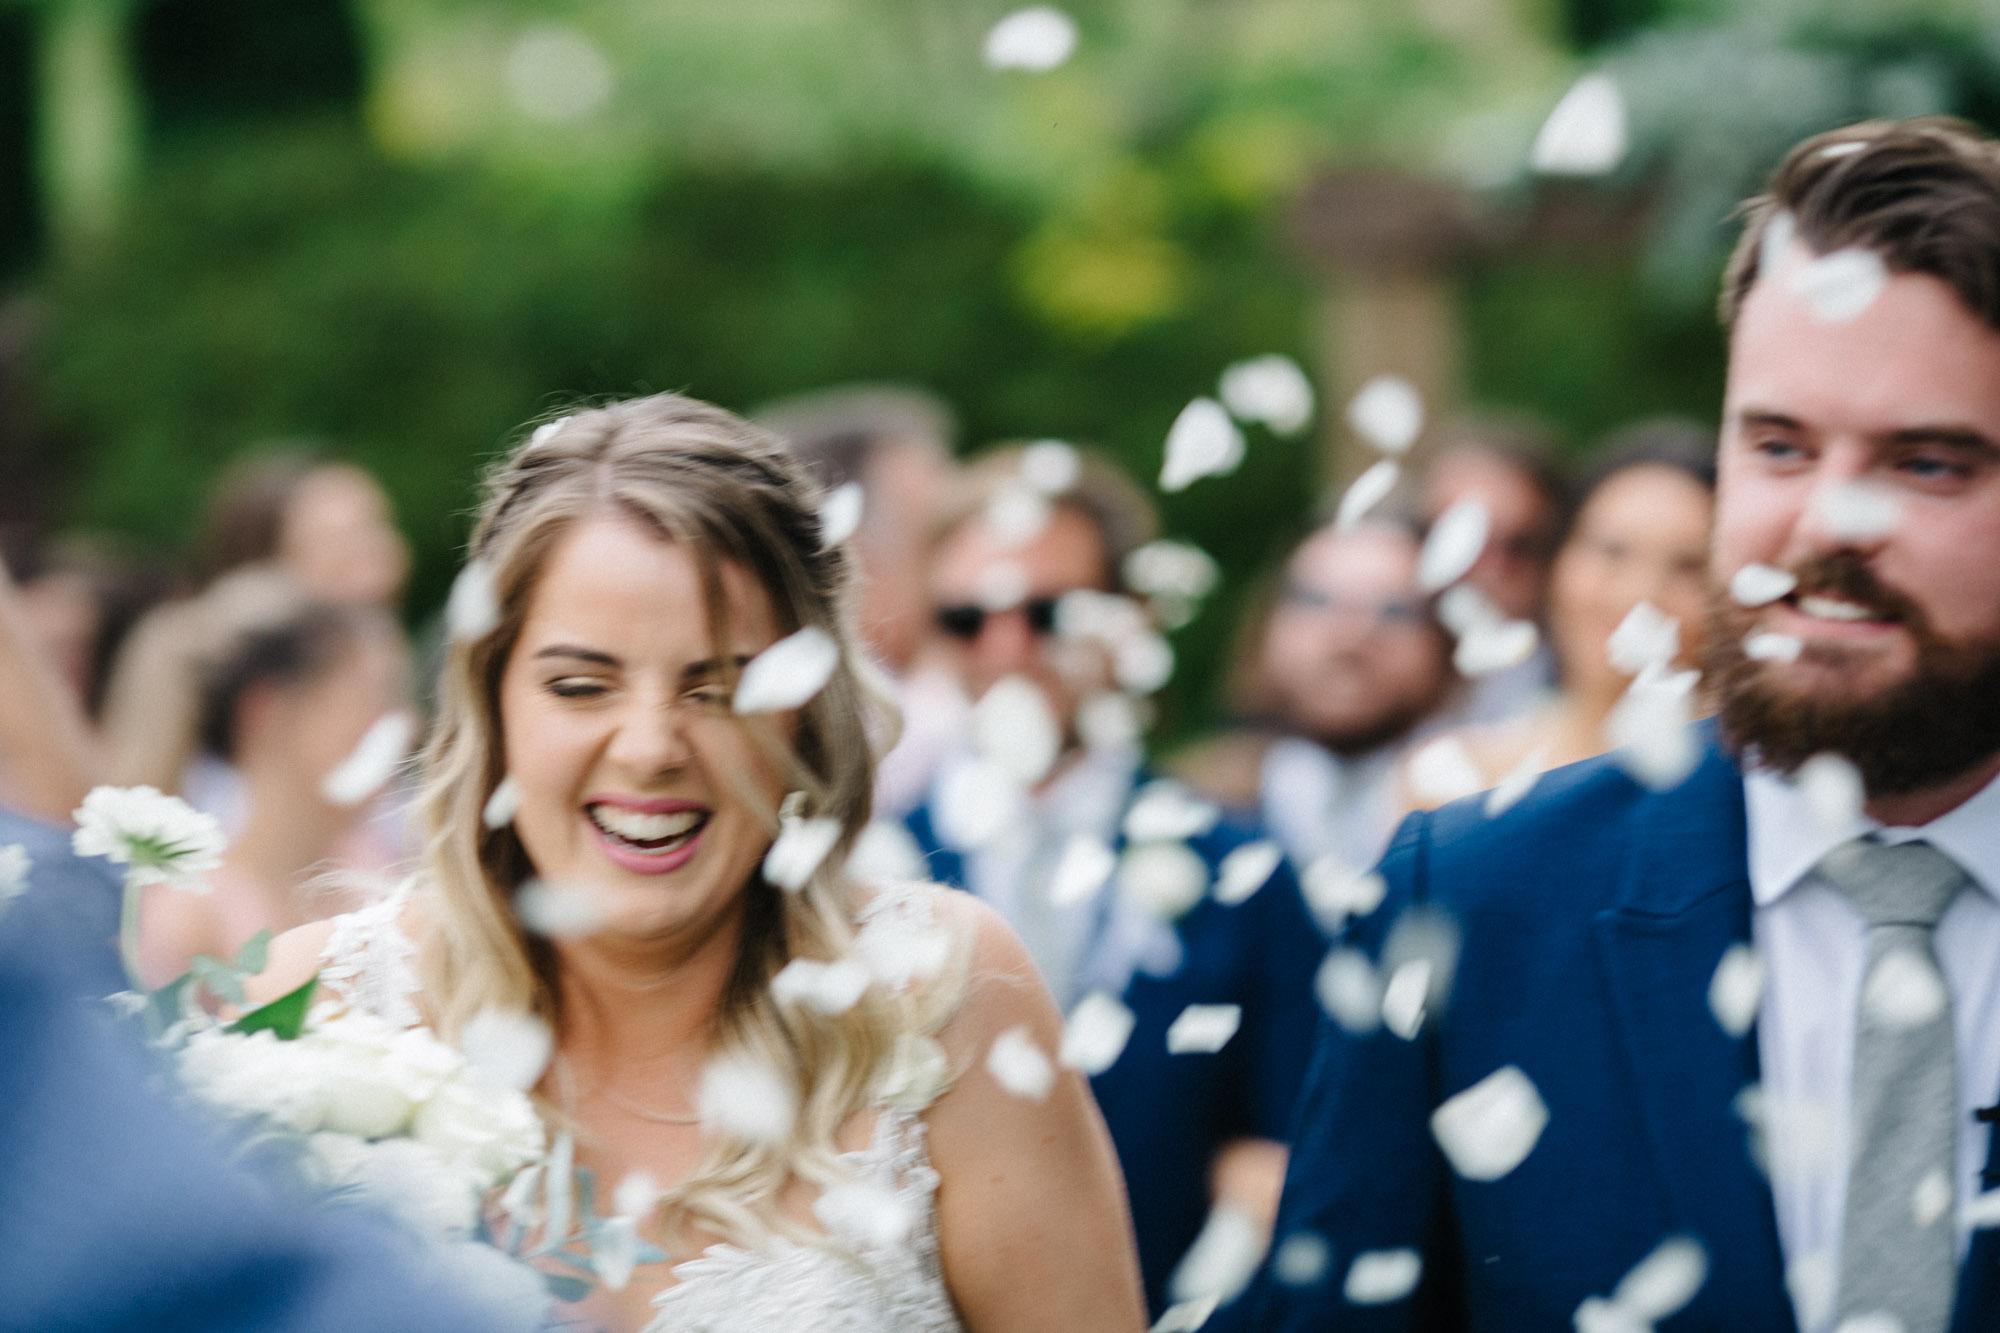 Golding-Wines-wedding-photography-067.jpg